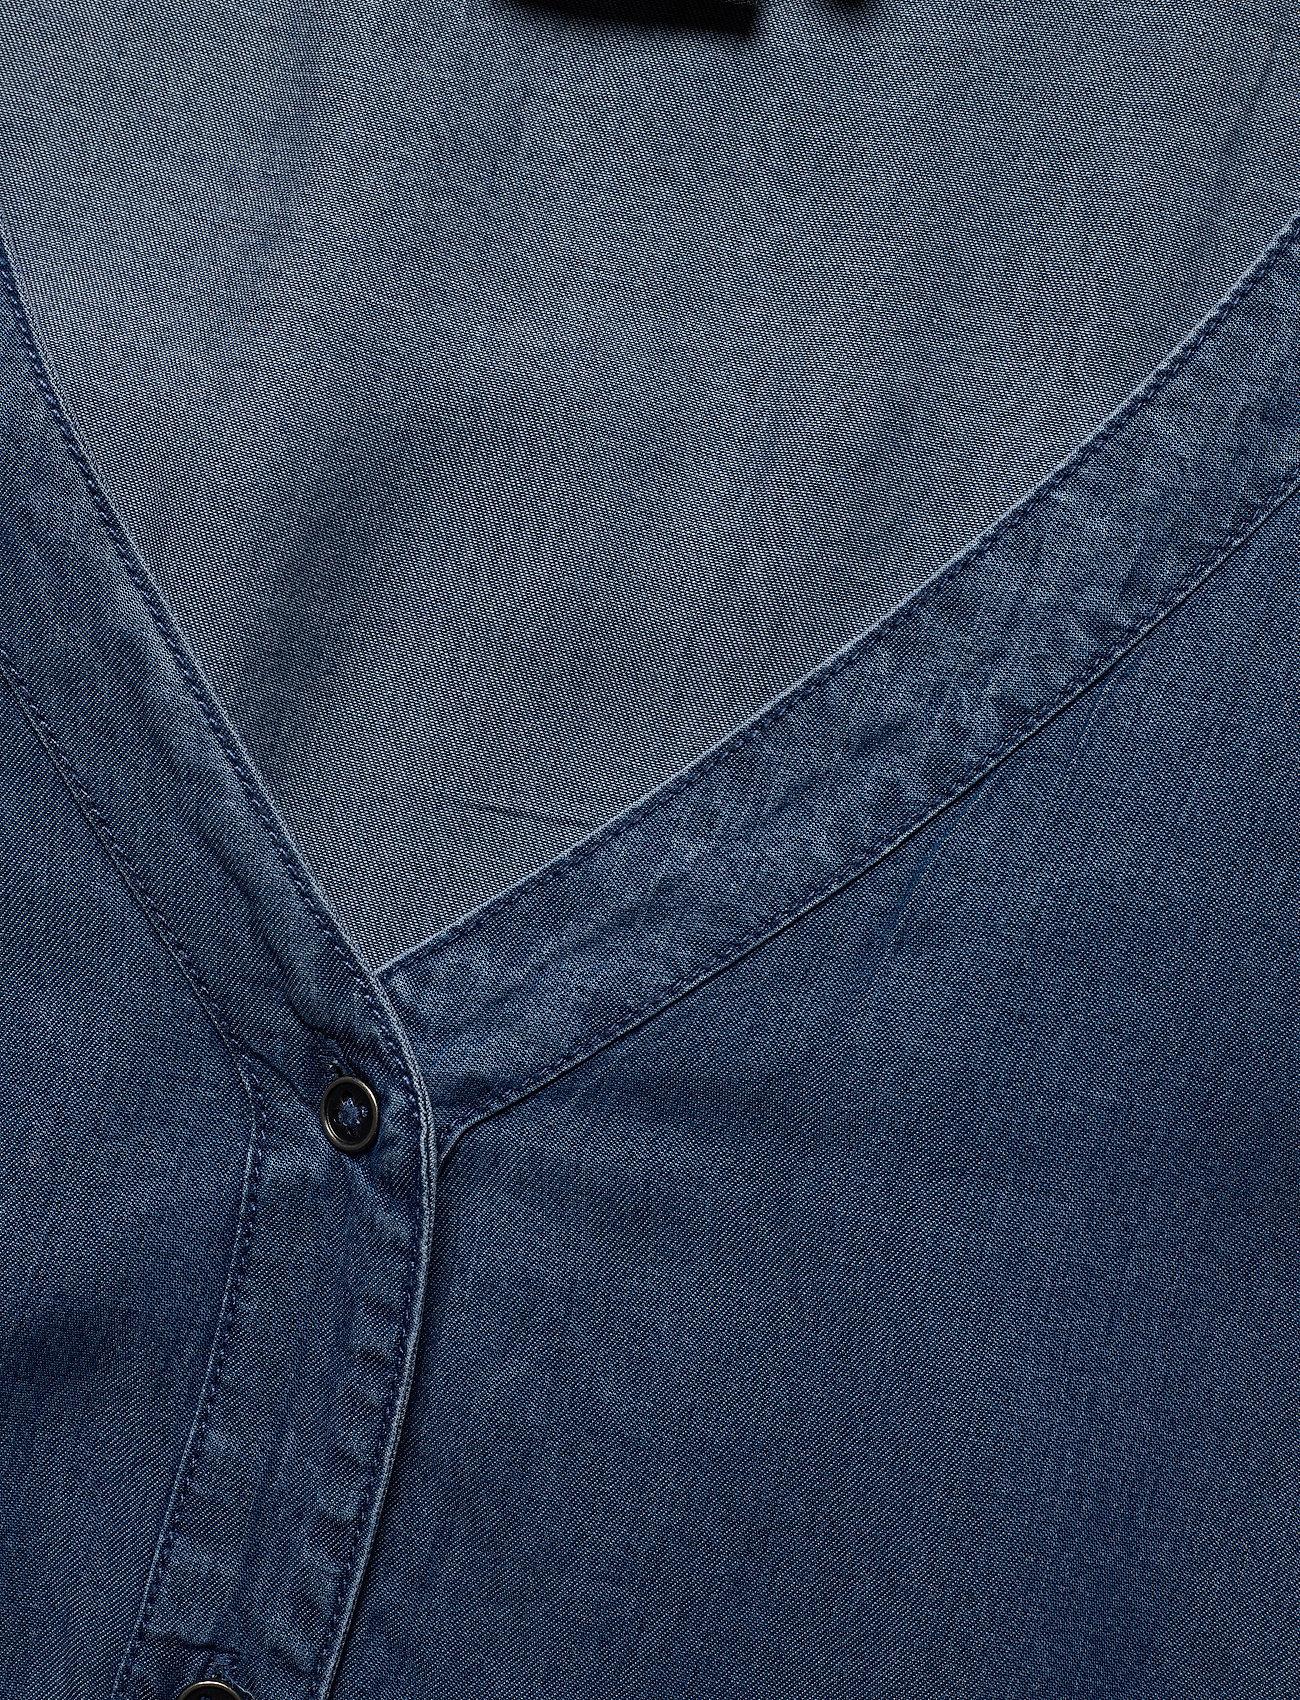 Zizzi Misallas, S/s, Dress - Klänningar Blue